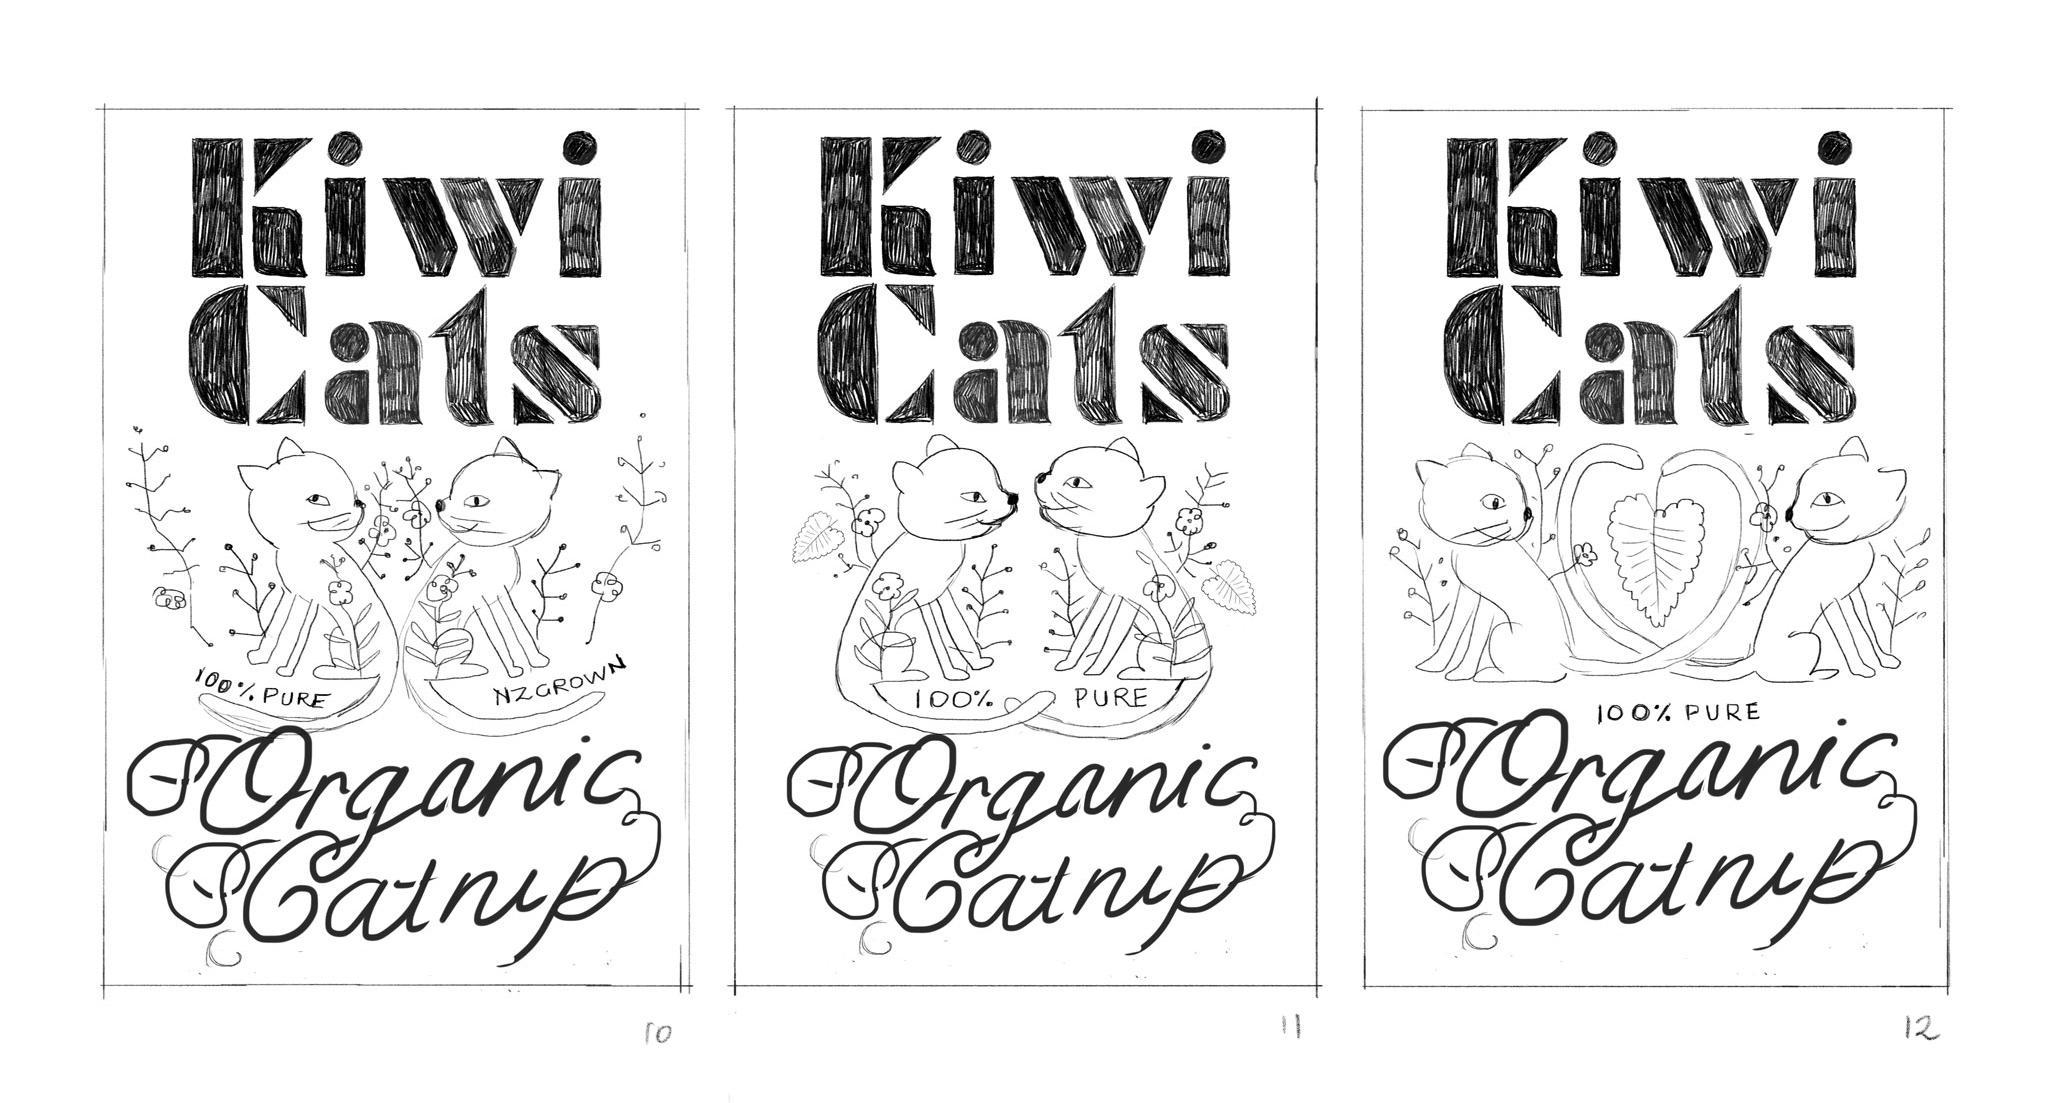 Organic Catnip Label - image 10 - student project